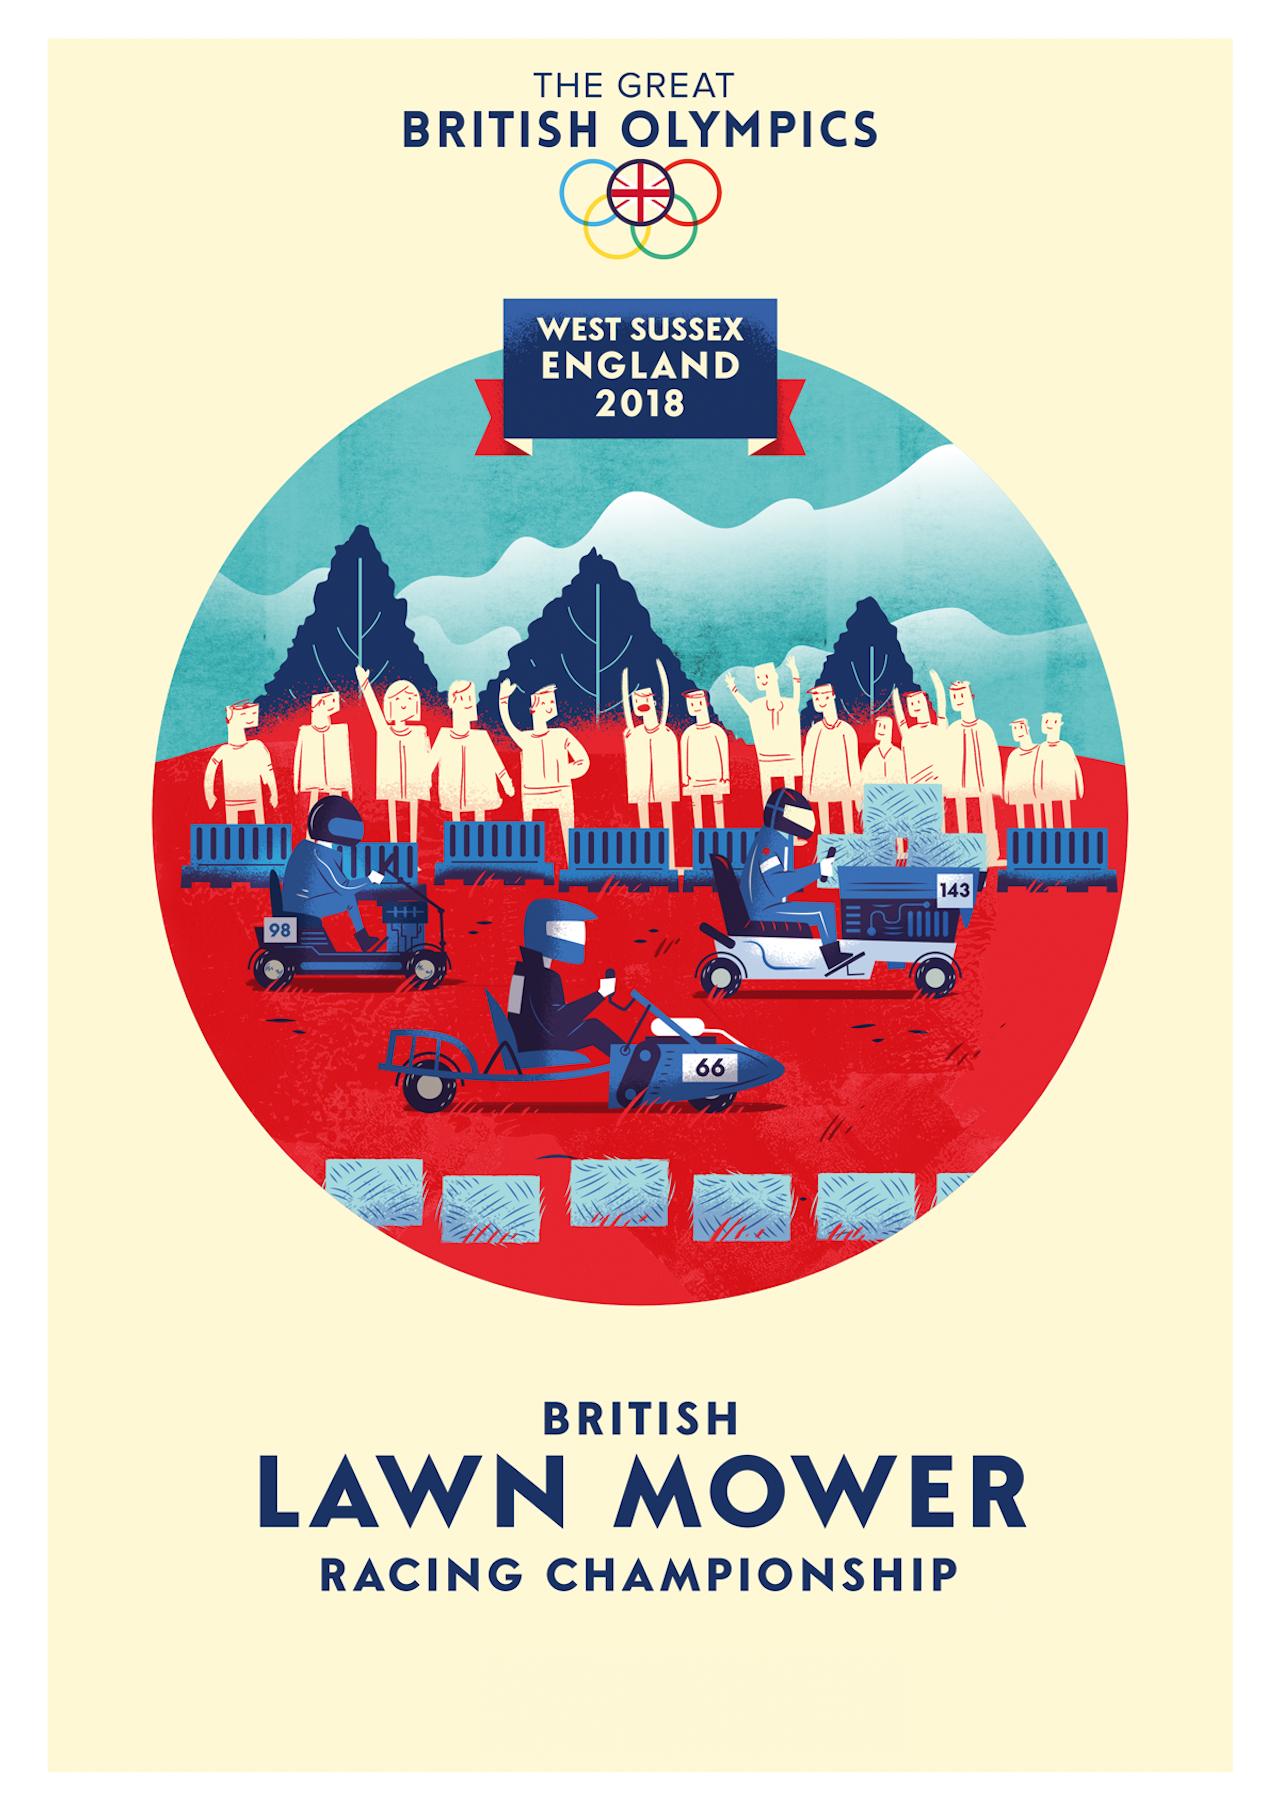 British Olympics_03 Lawn Mower